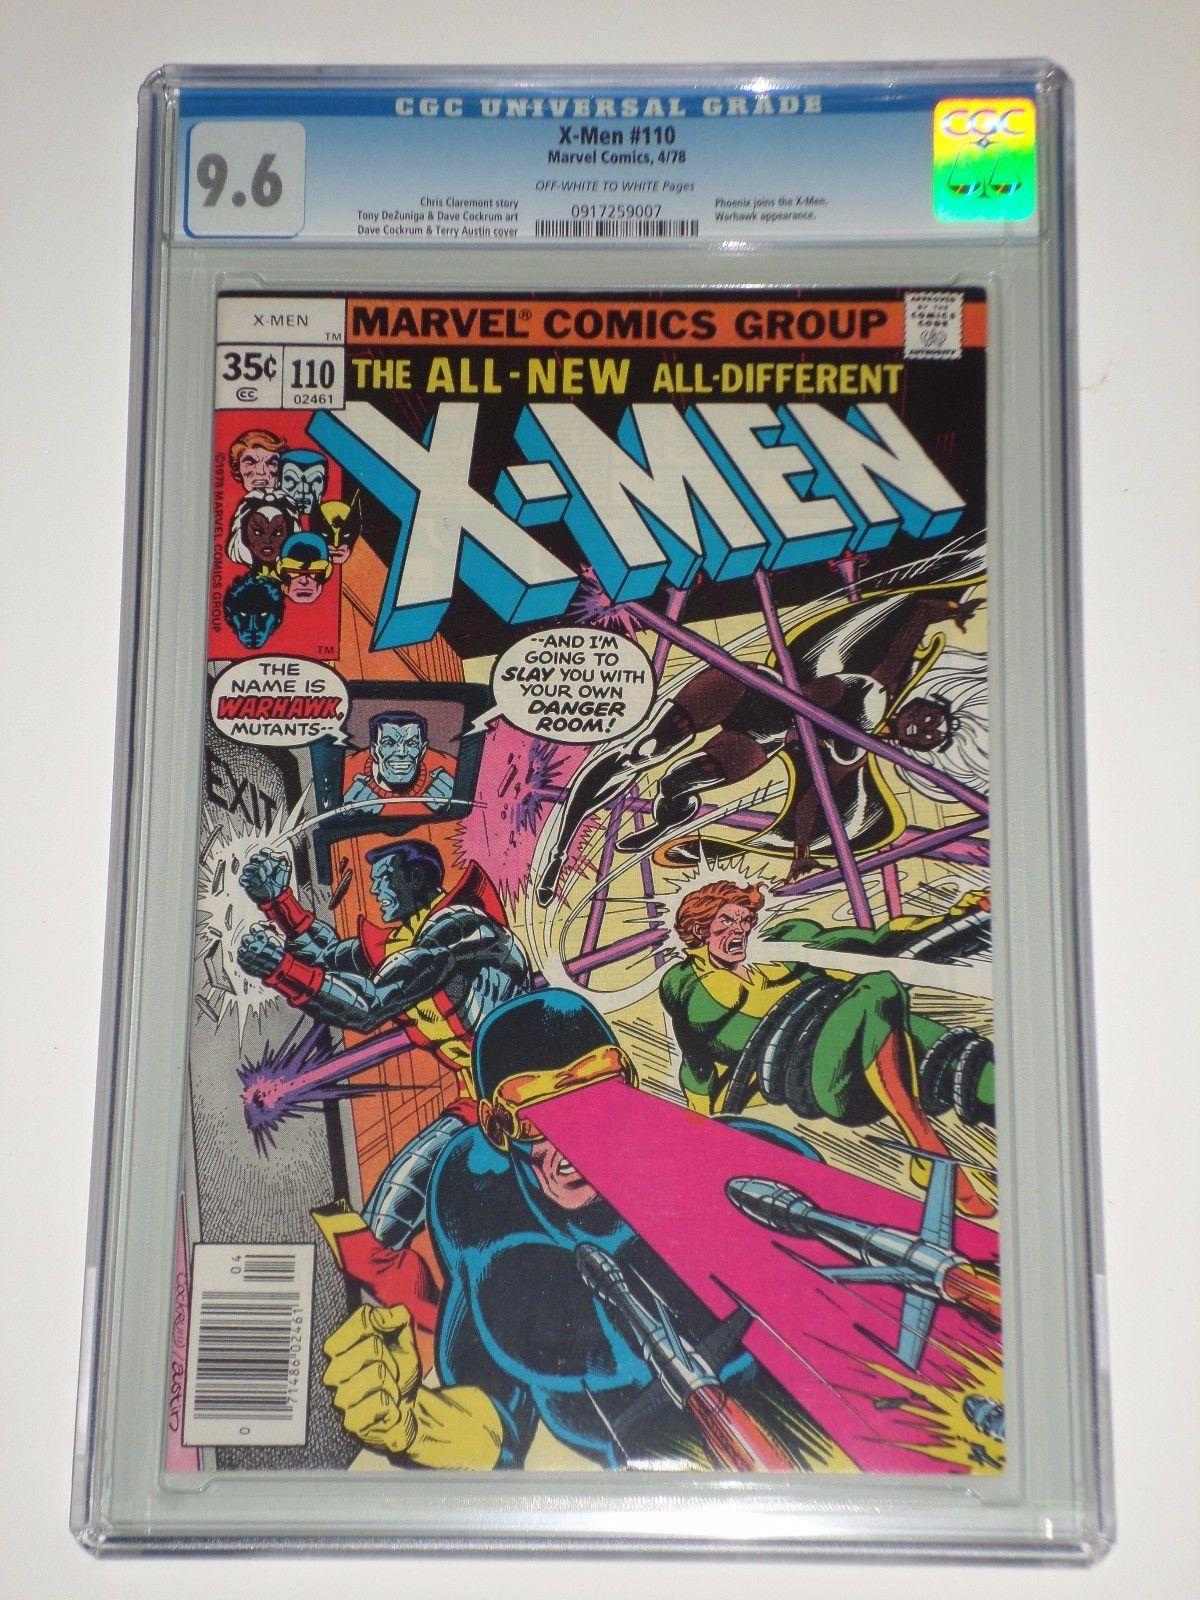 X-Men (Uncanny) 110 (Apr 1978, Marvel) CGC Graded 9.6